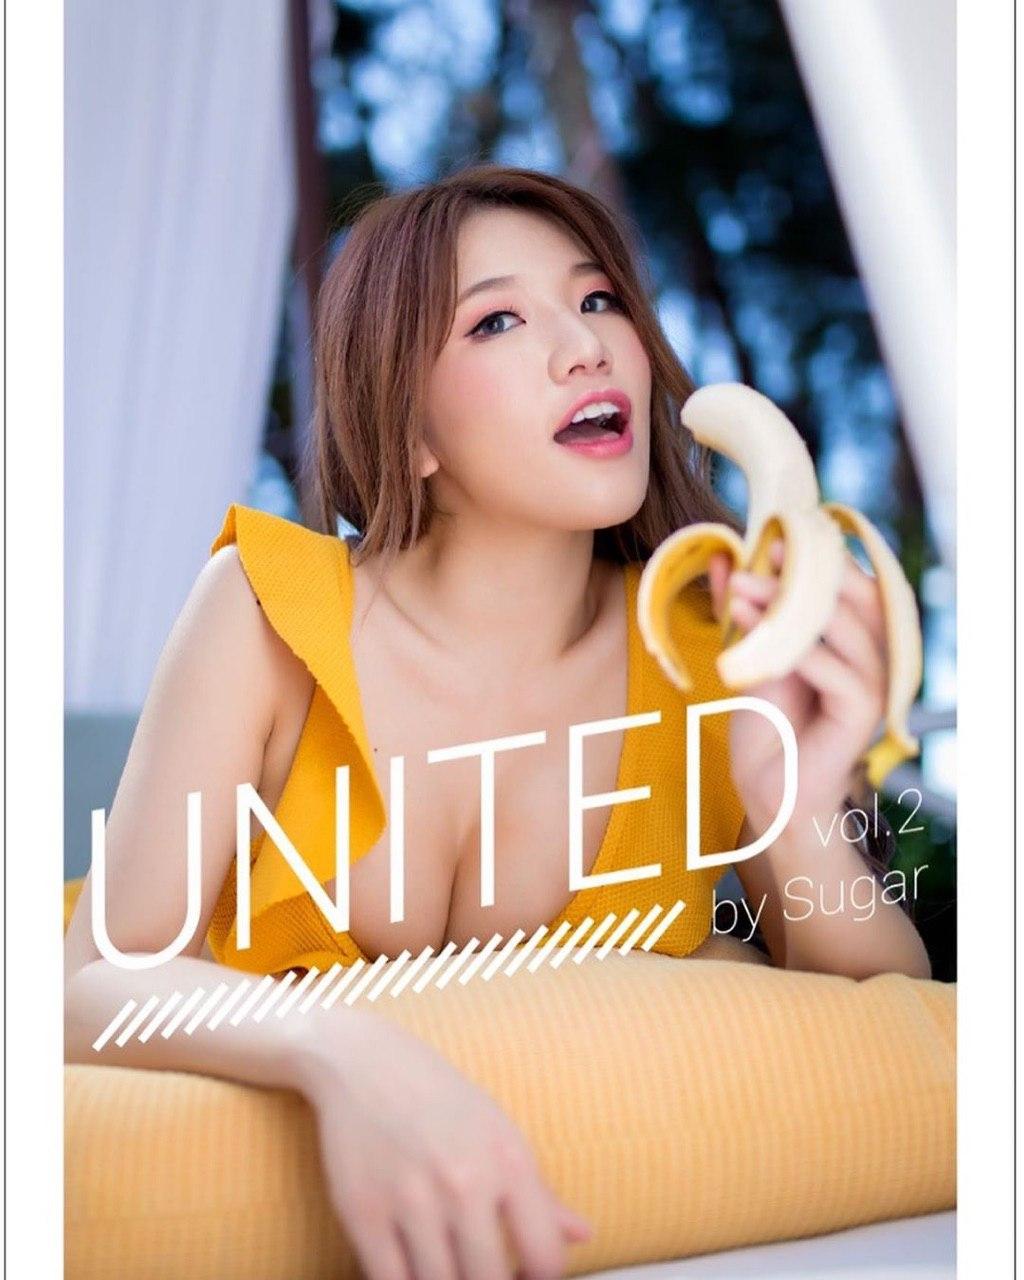 photo_2895@12-01-2020_19-17-09.jpg